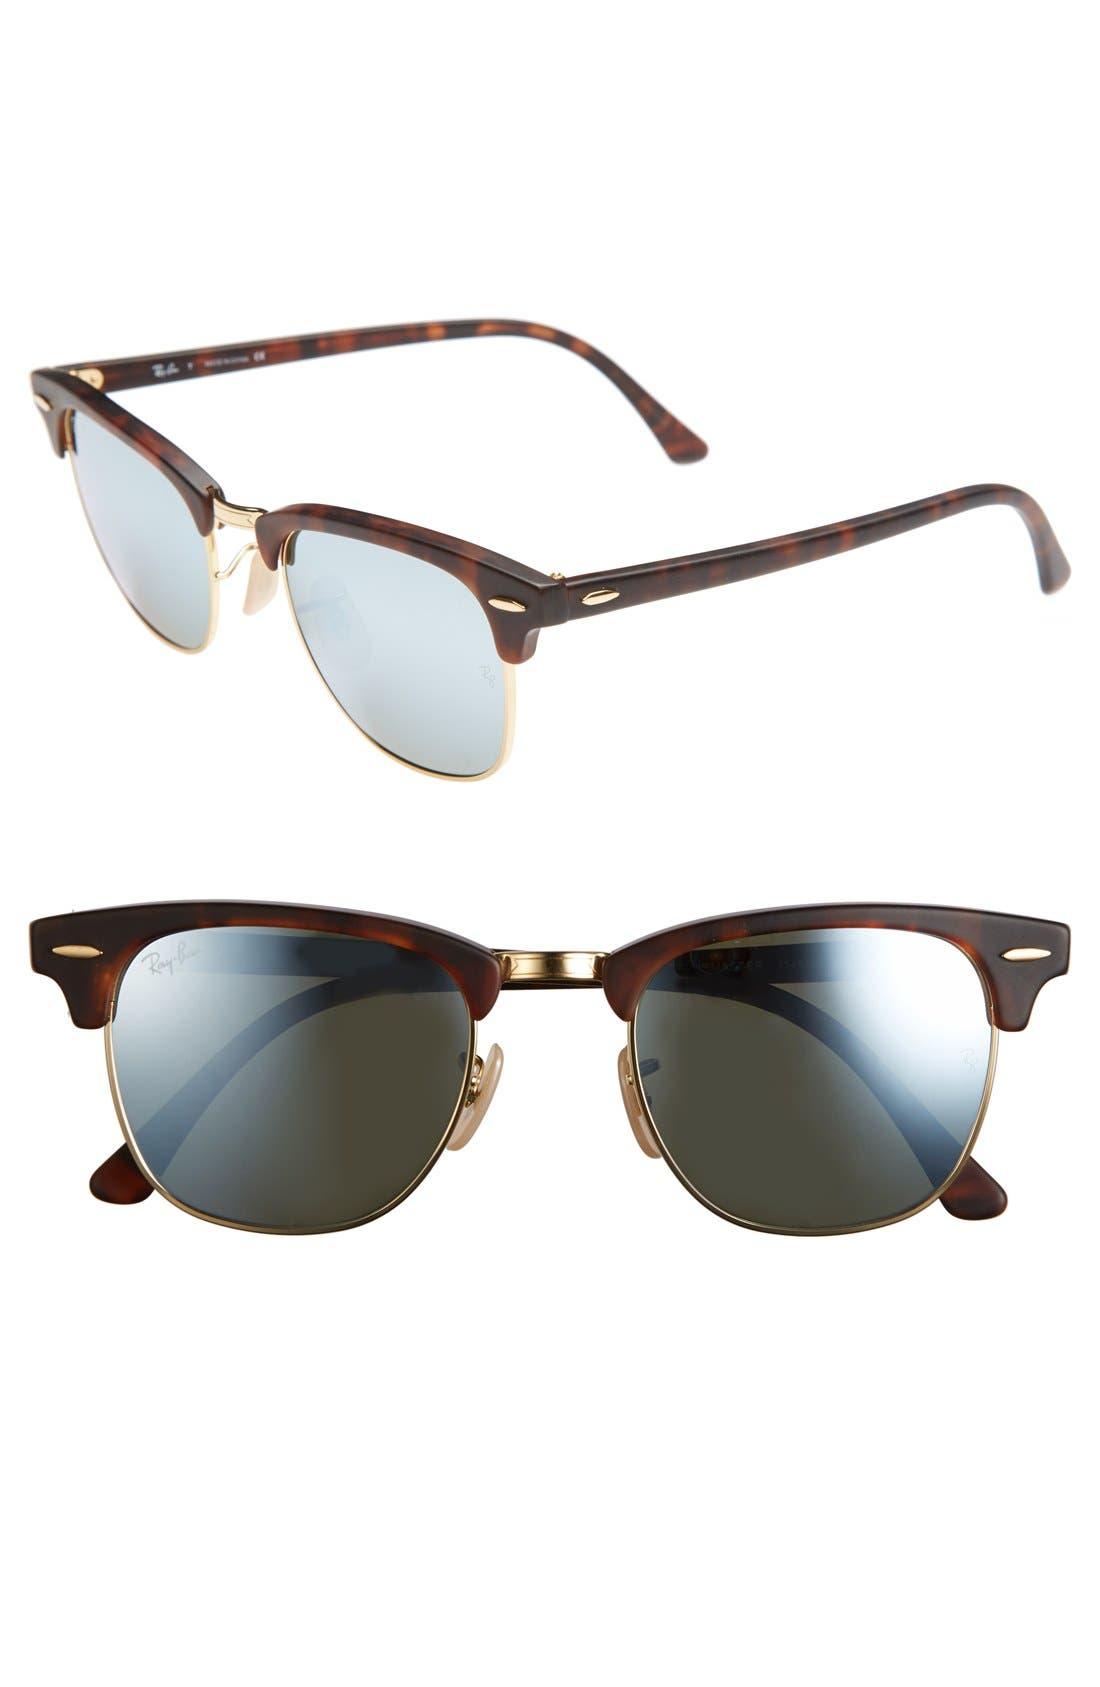 Main Image - Ray-Ban 'Clubmaster' 49mm Polarized Sunglasses